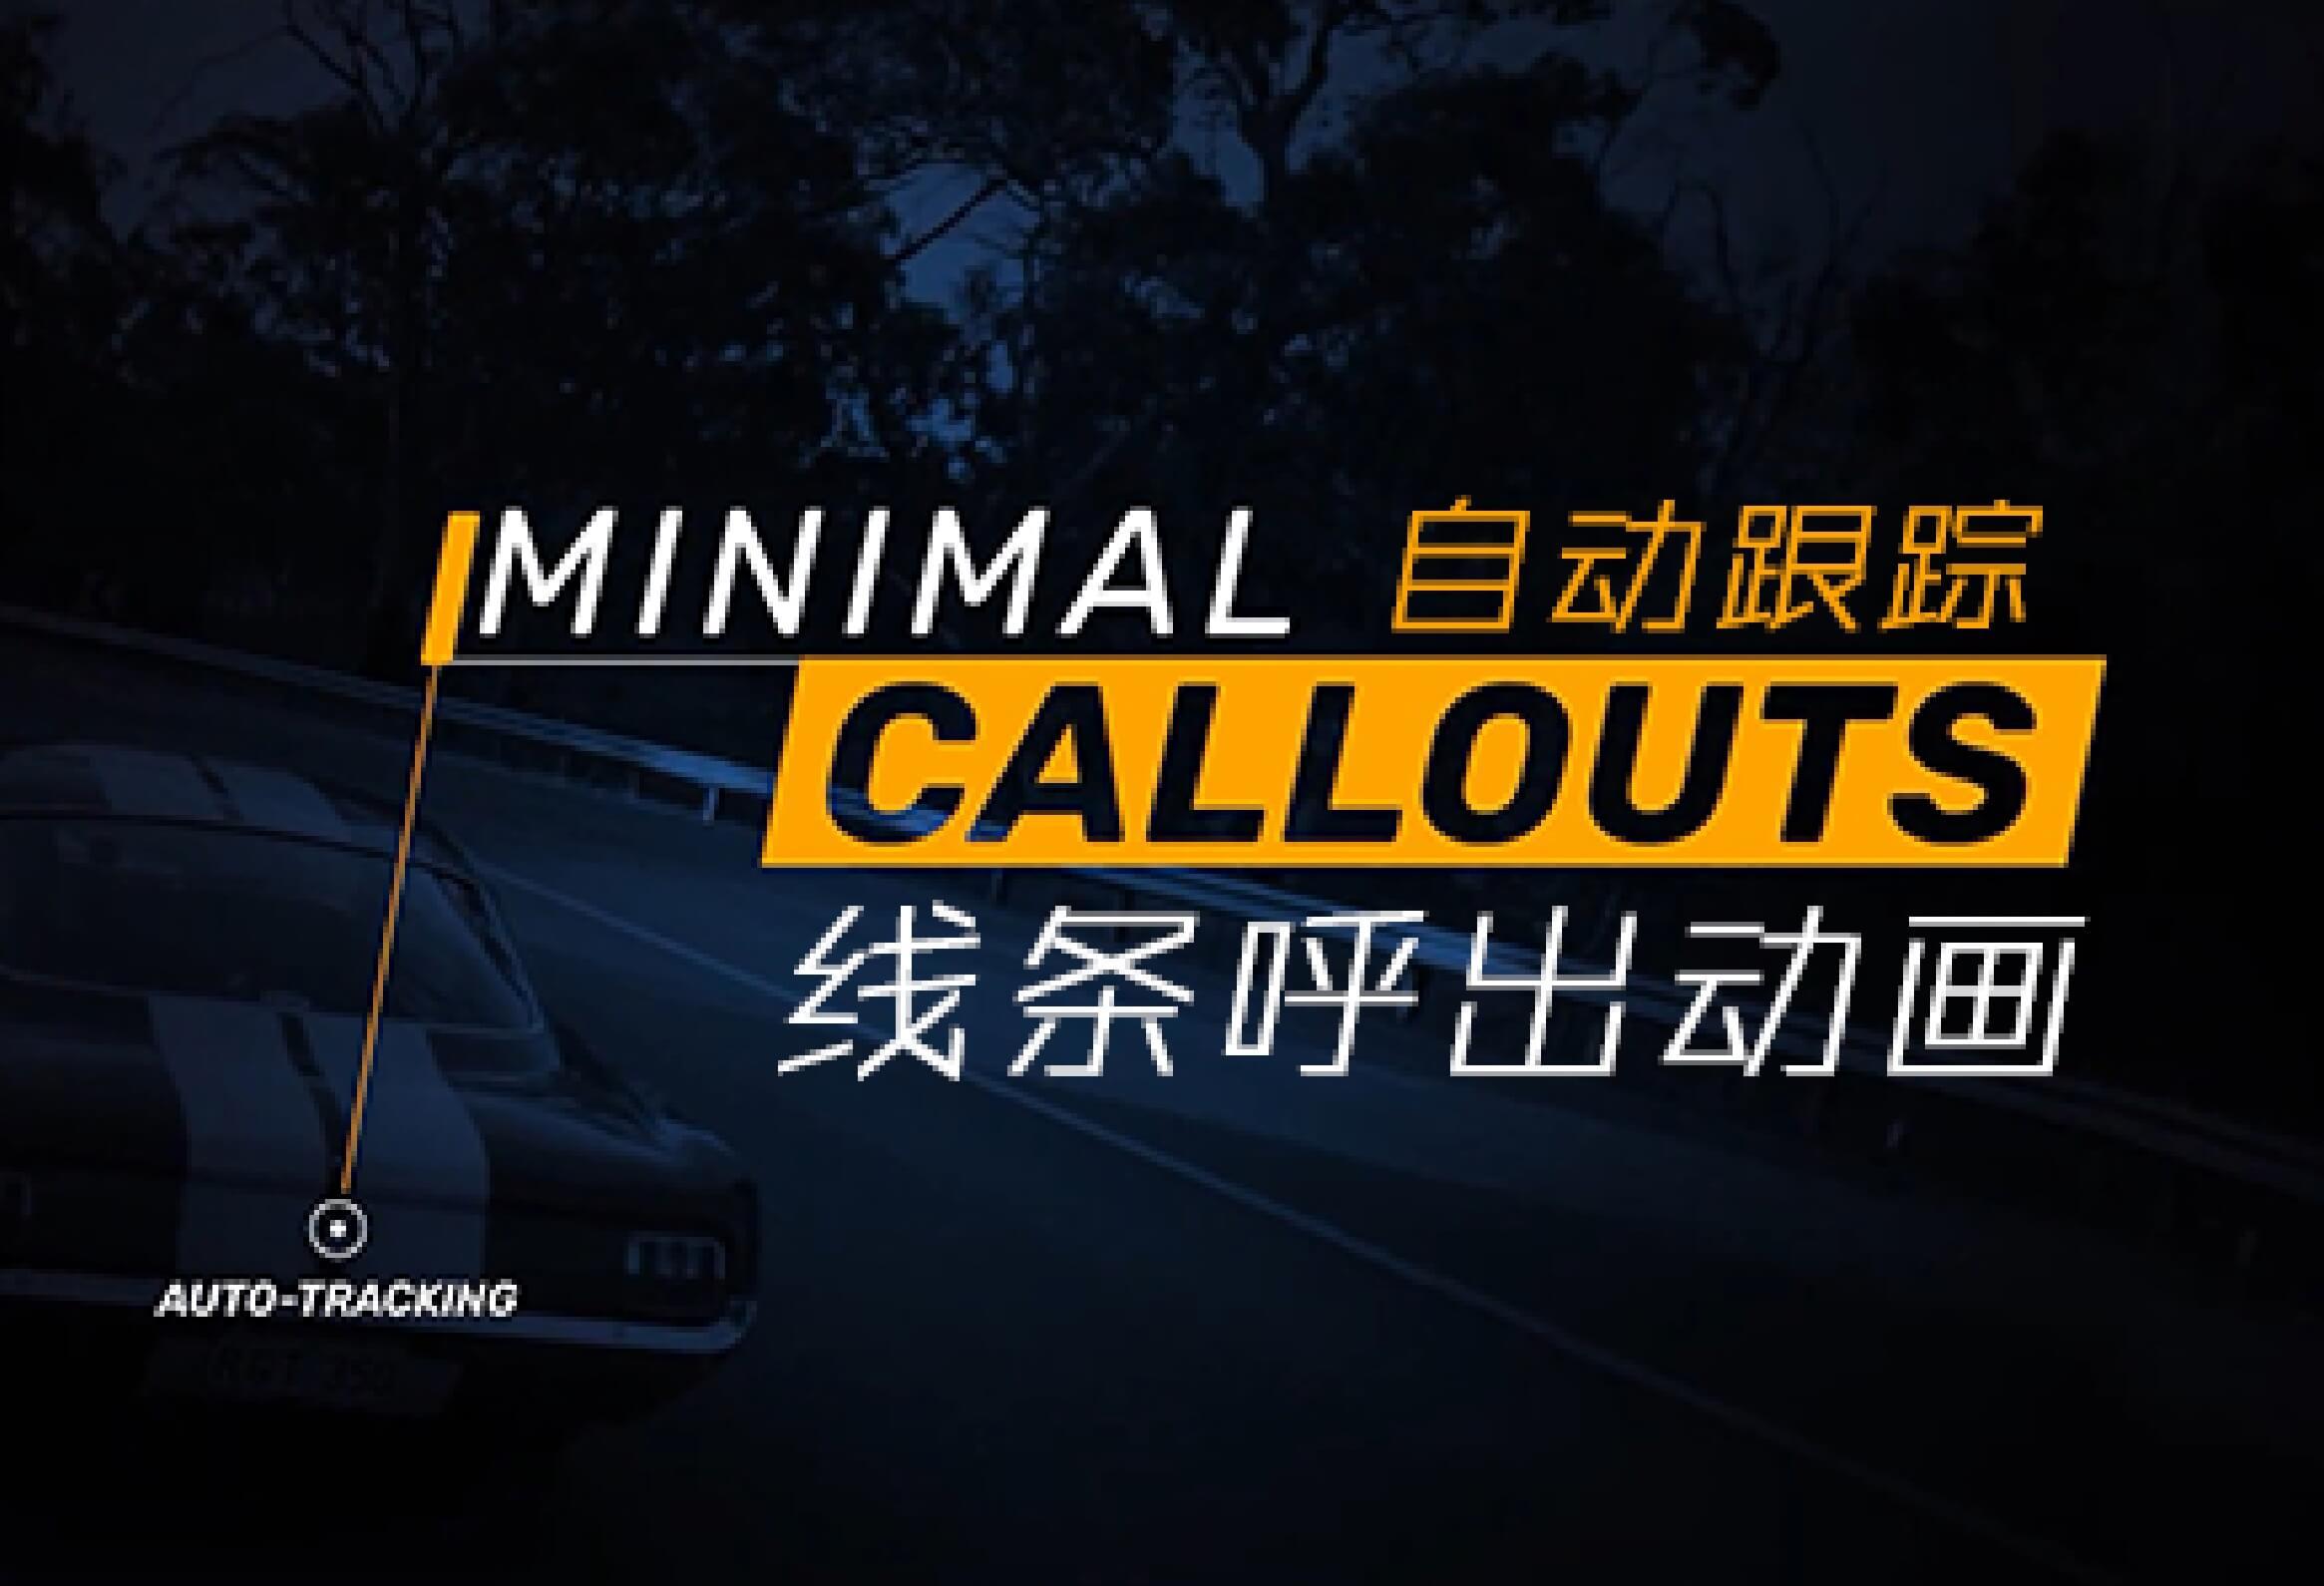 fcpx插件 30组线条呼出动画字幕标题注释自动跟踪对象 Minimal Callouts